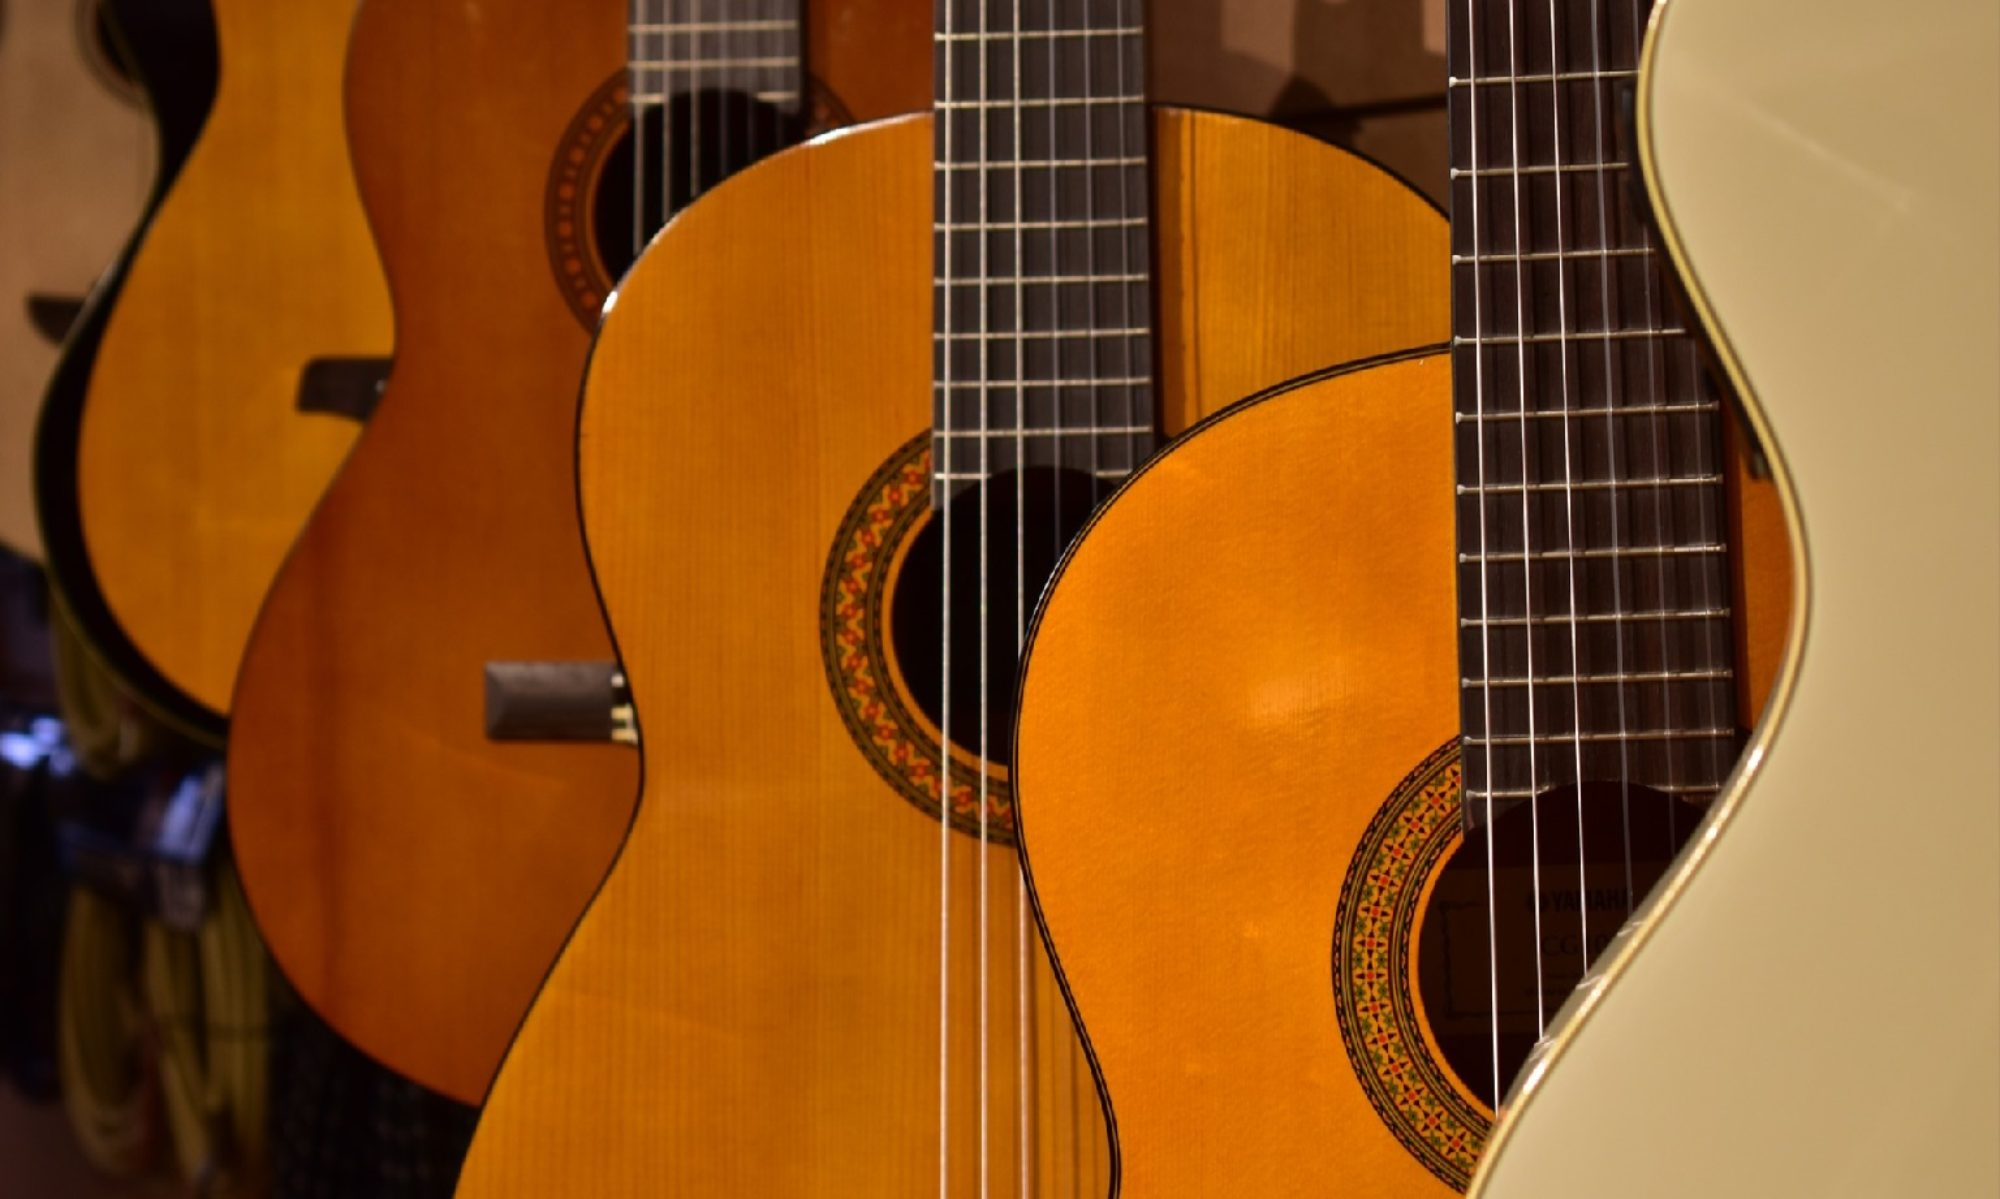 ギター音楽大賞